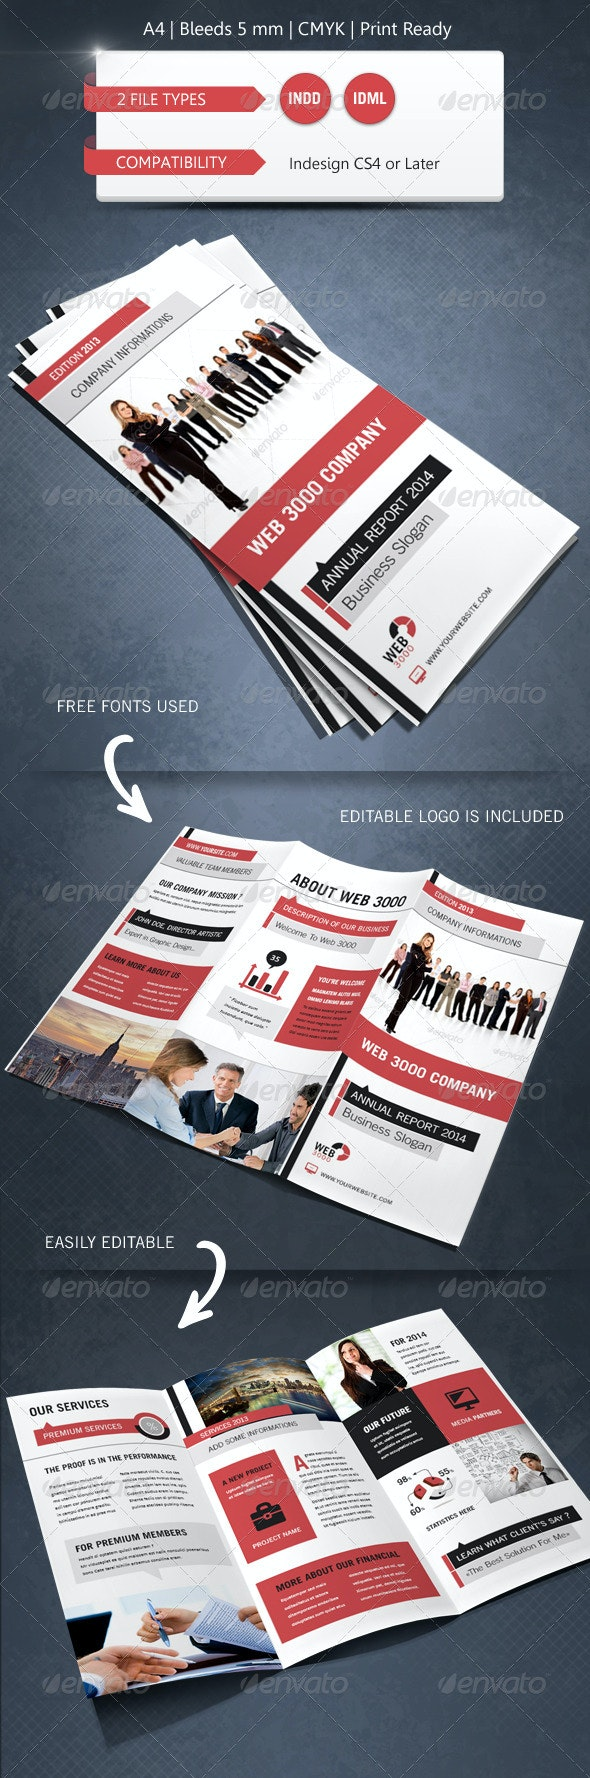 Modern & Corporate Trifold Brochure Template - Corporate Brochures